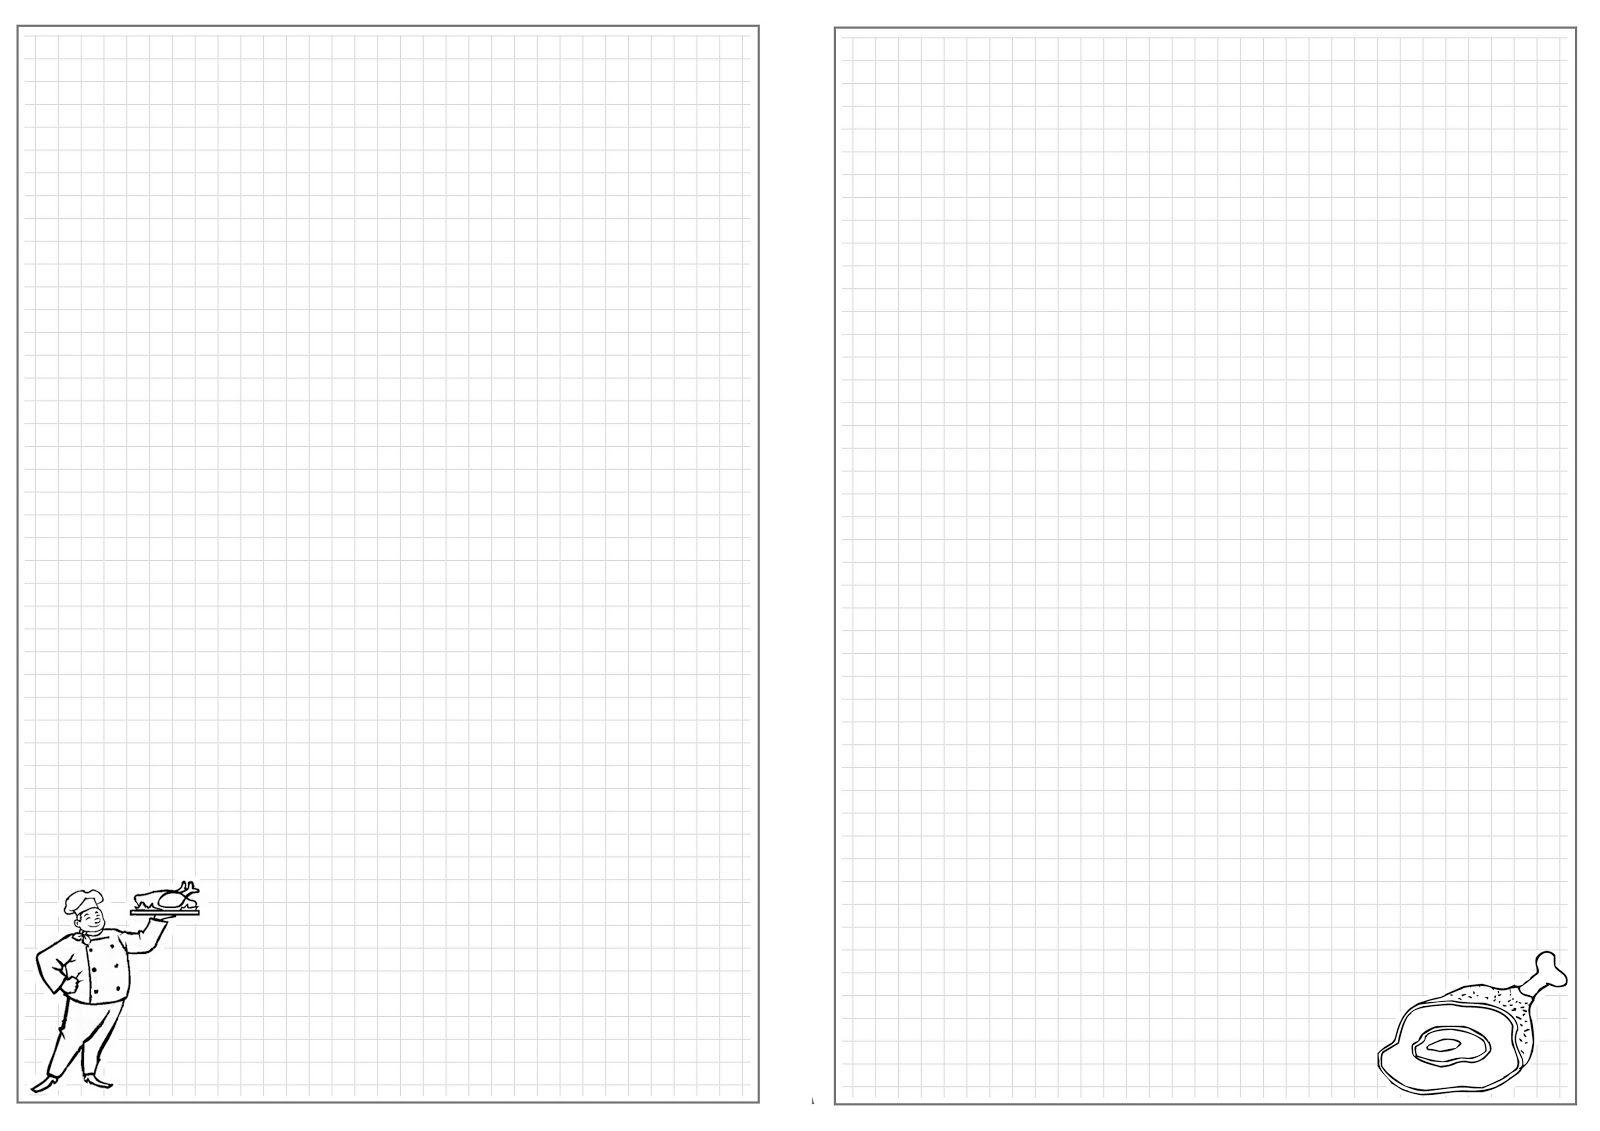 Открытку днем, страницы для блокнота шаблоны а6